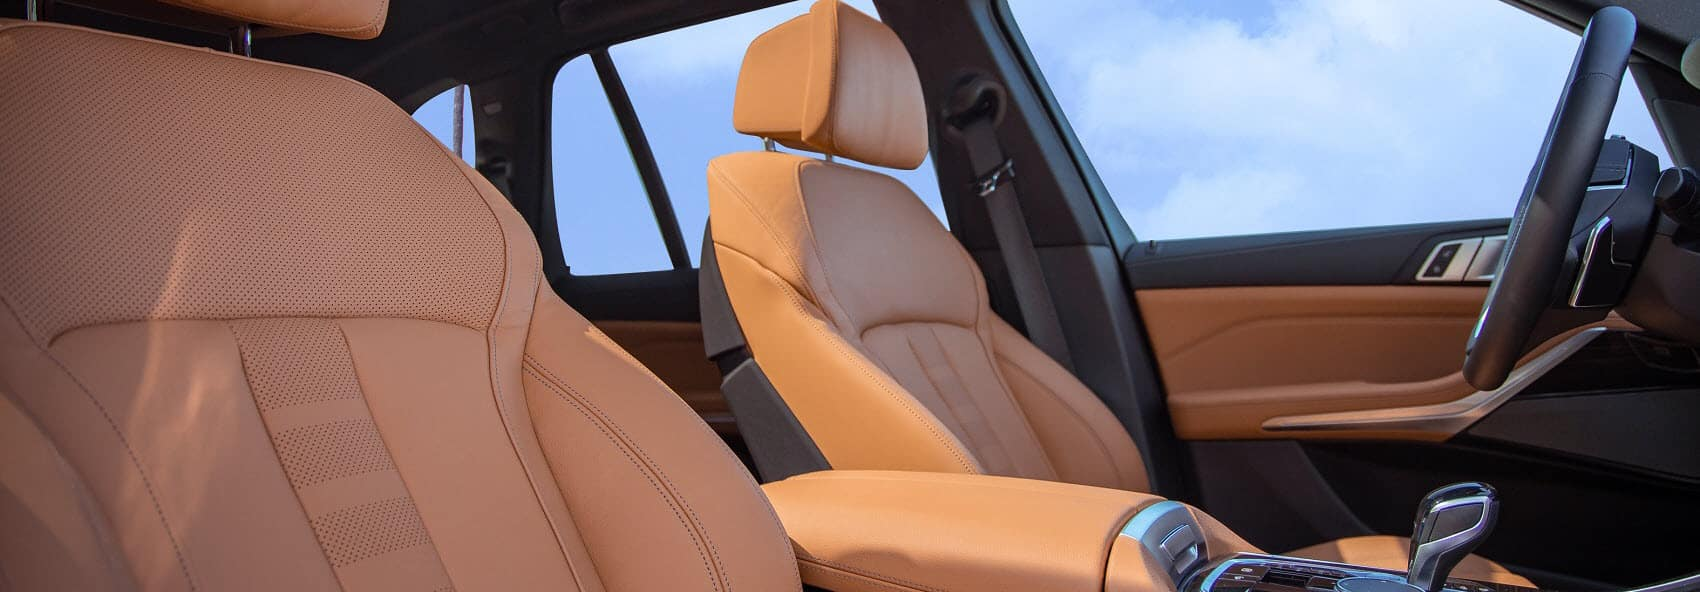 BMW X5 Interior Seats